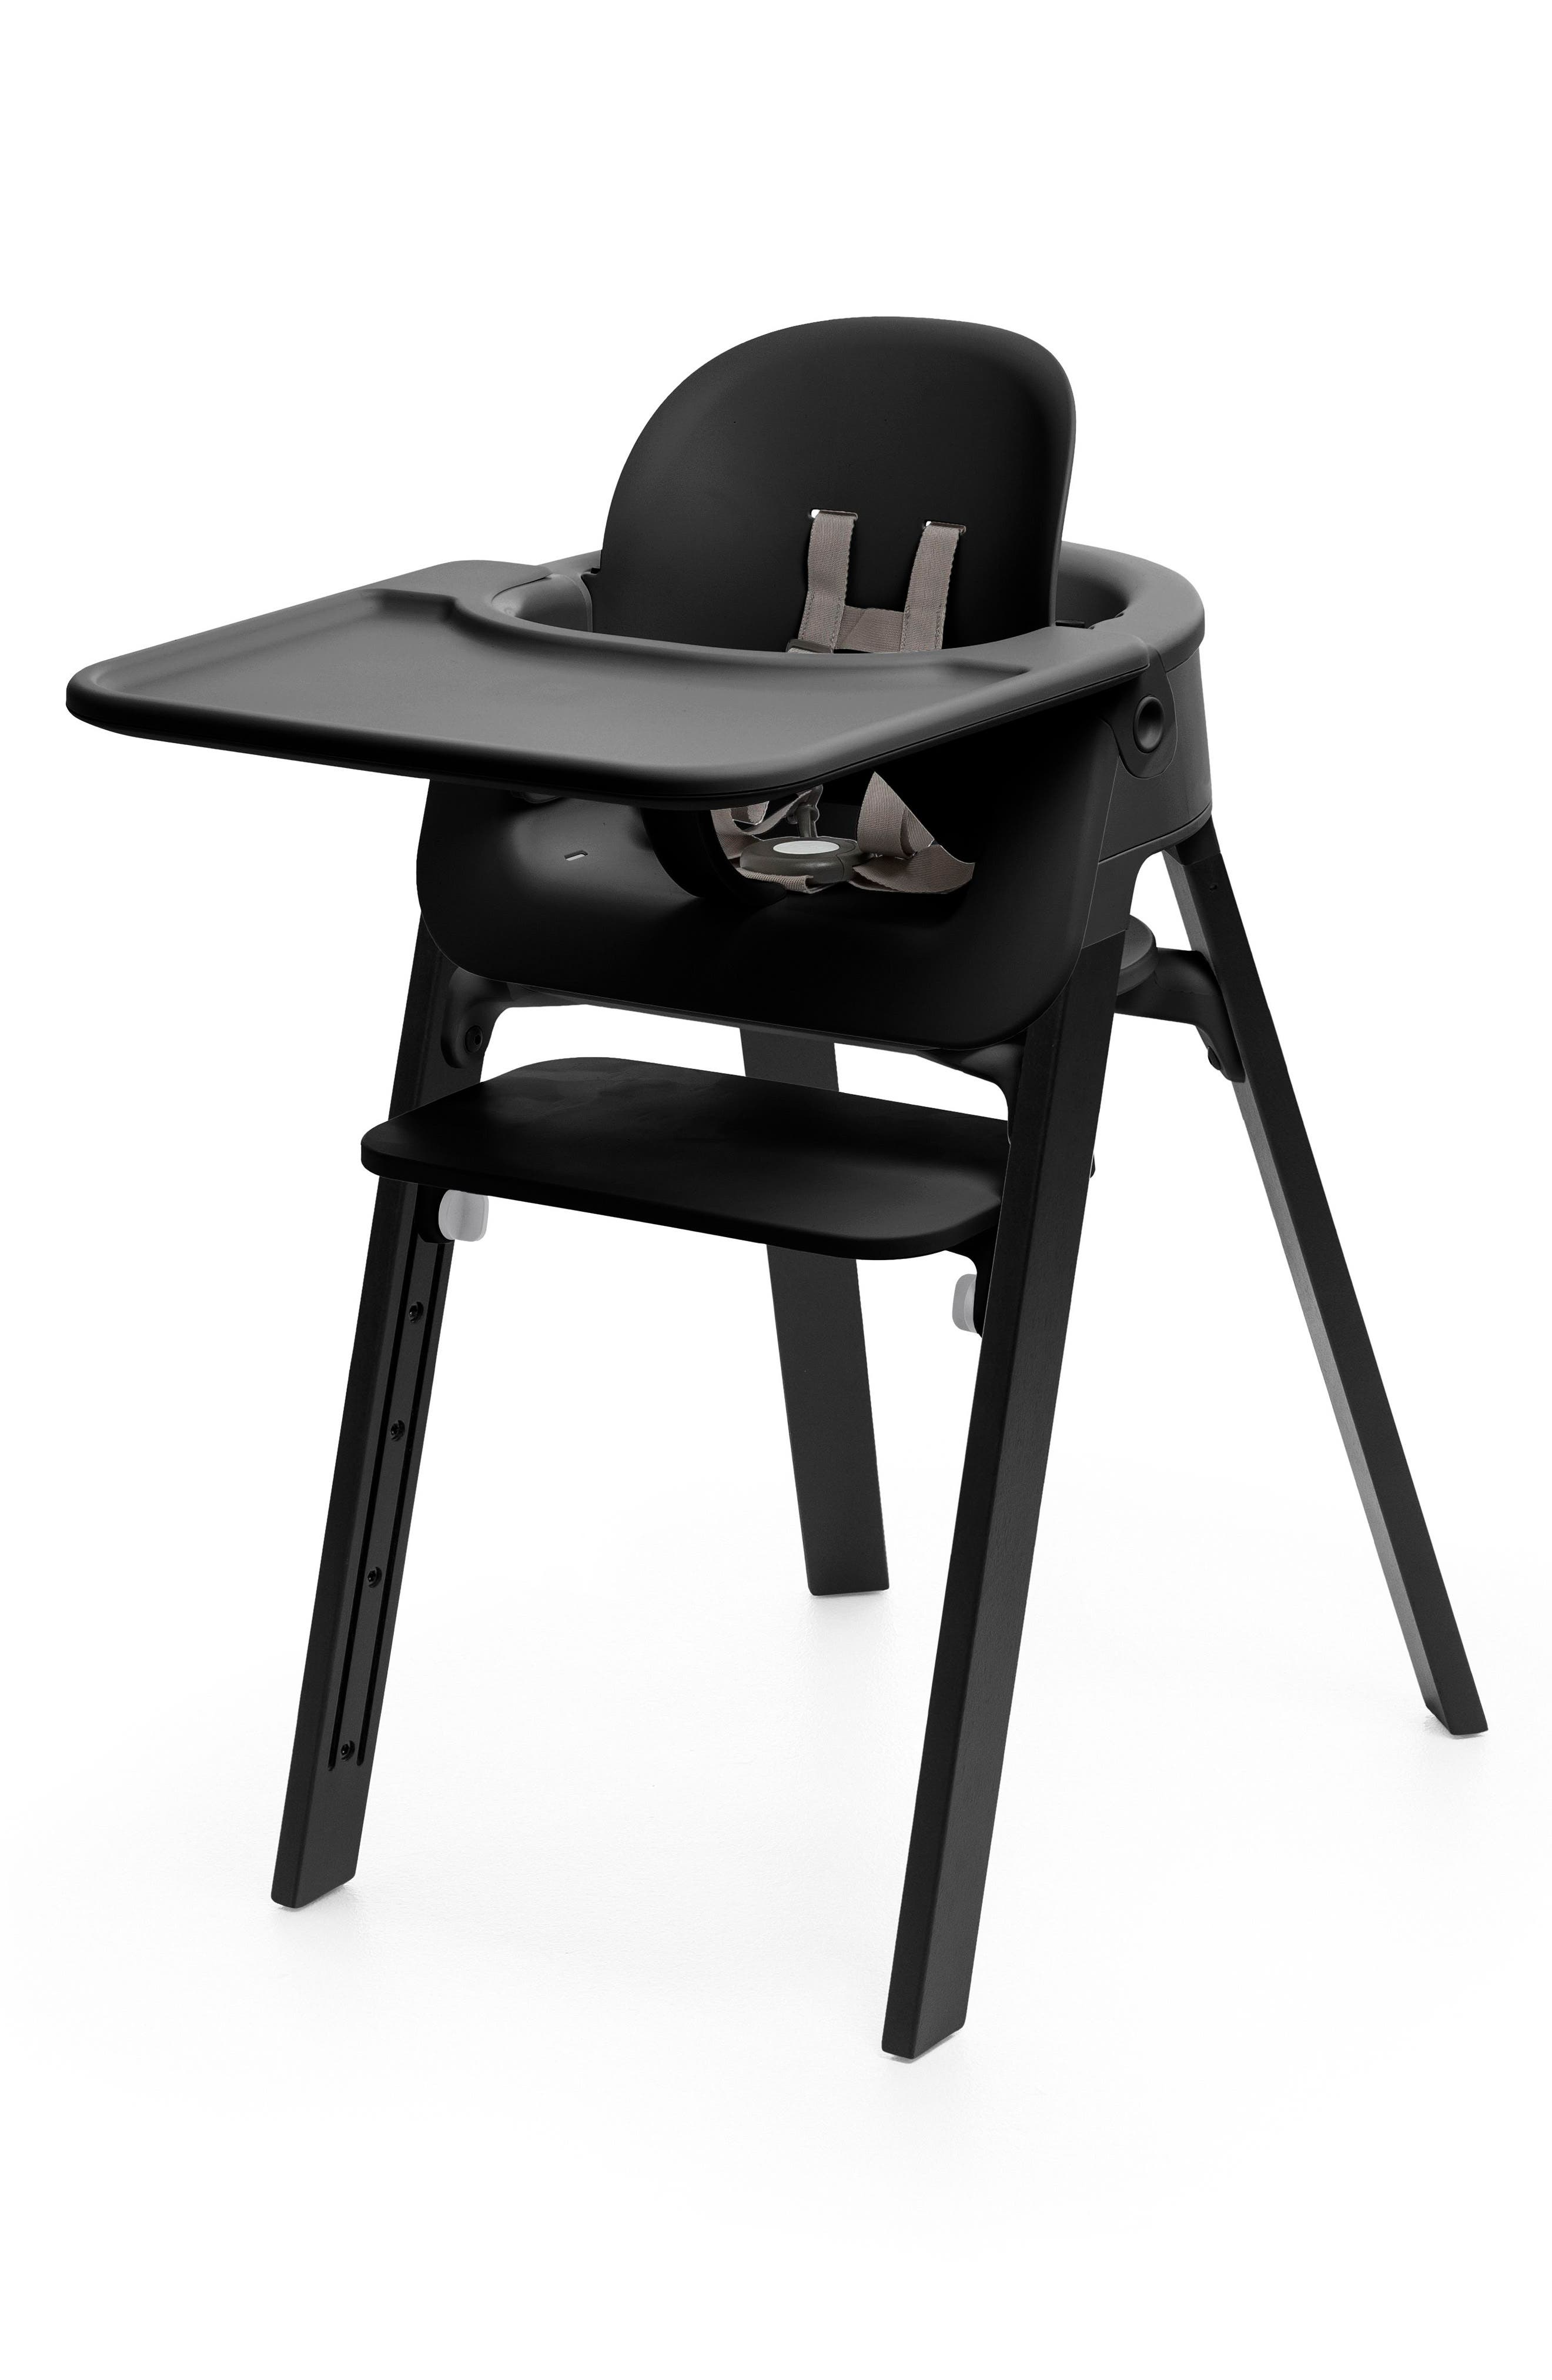 Main Image - Stokke Steps™ Baby Seat Tray